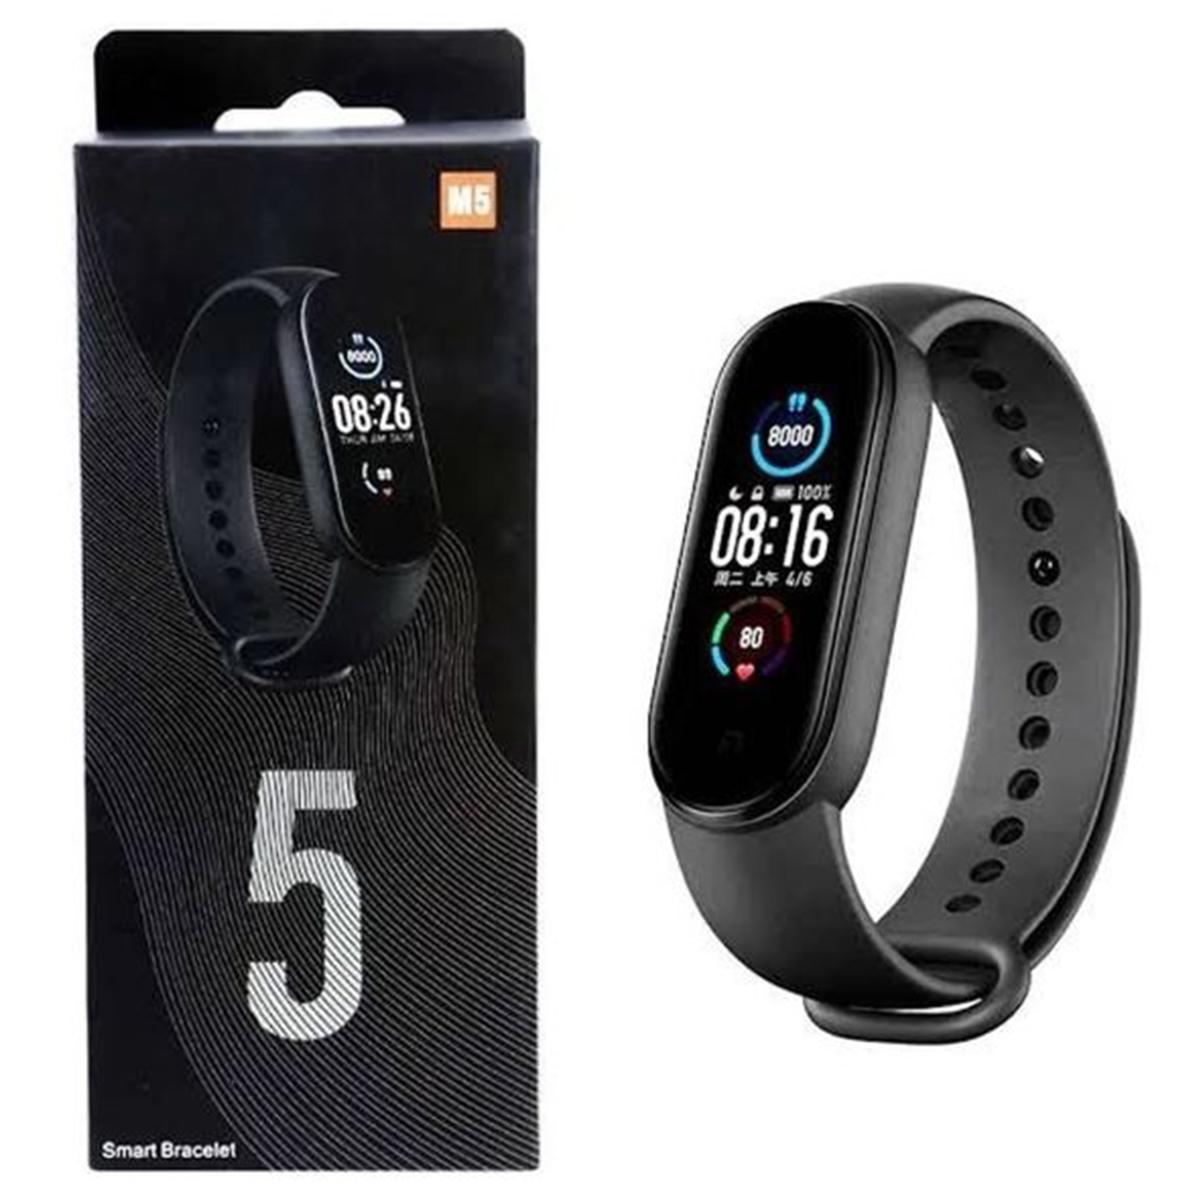 Relógio Inteligente Smartwatch M5 Bluetooth Android/Ios